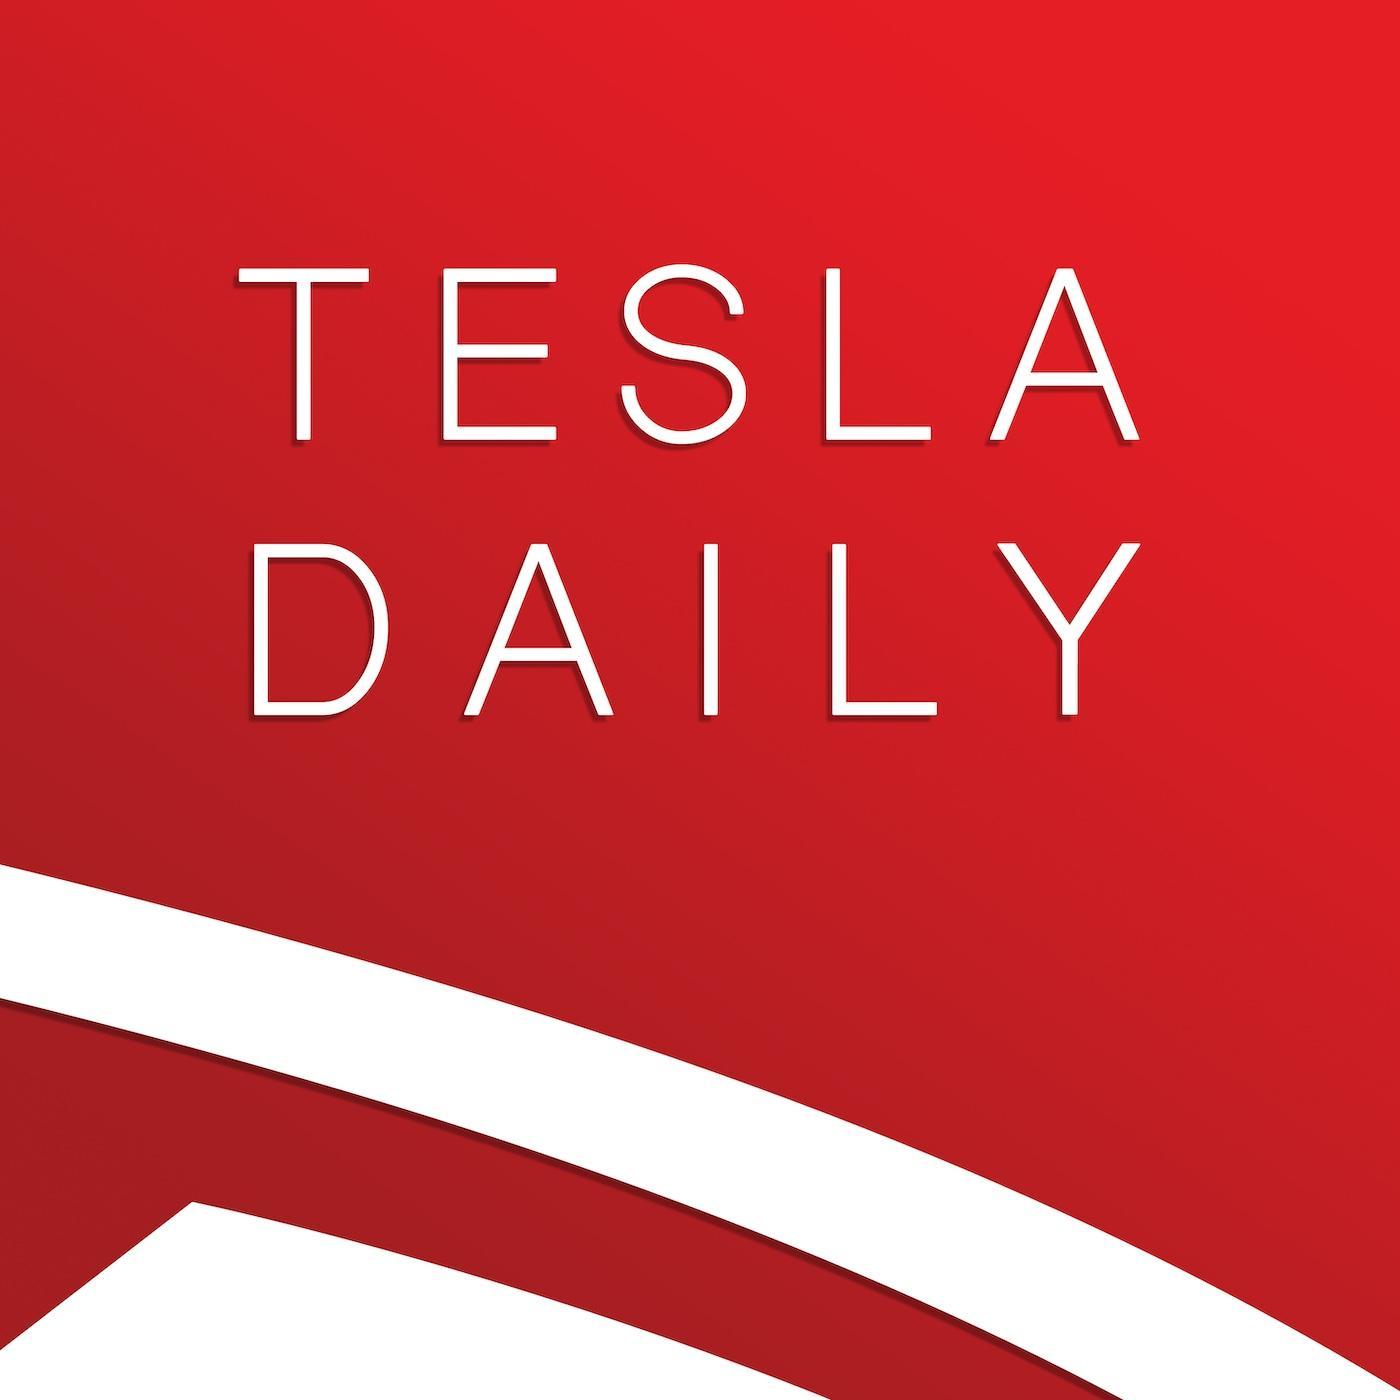 Model Y China Production Rate, Tesla Indonesia, Enhanced AP, BlackRock Increases Stake, $180 TSLA Price Target (02.05.21)